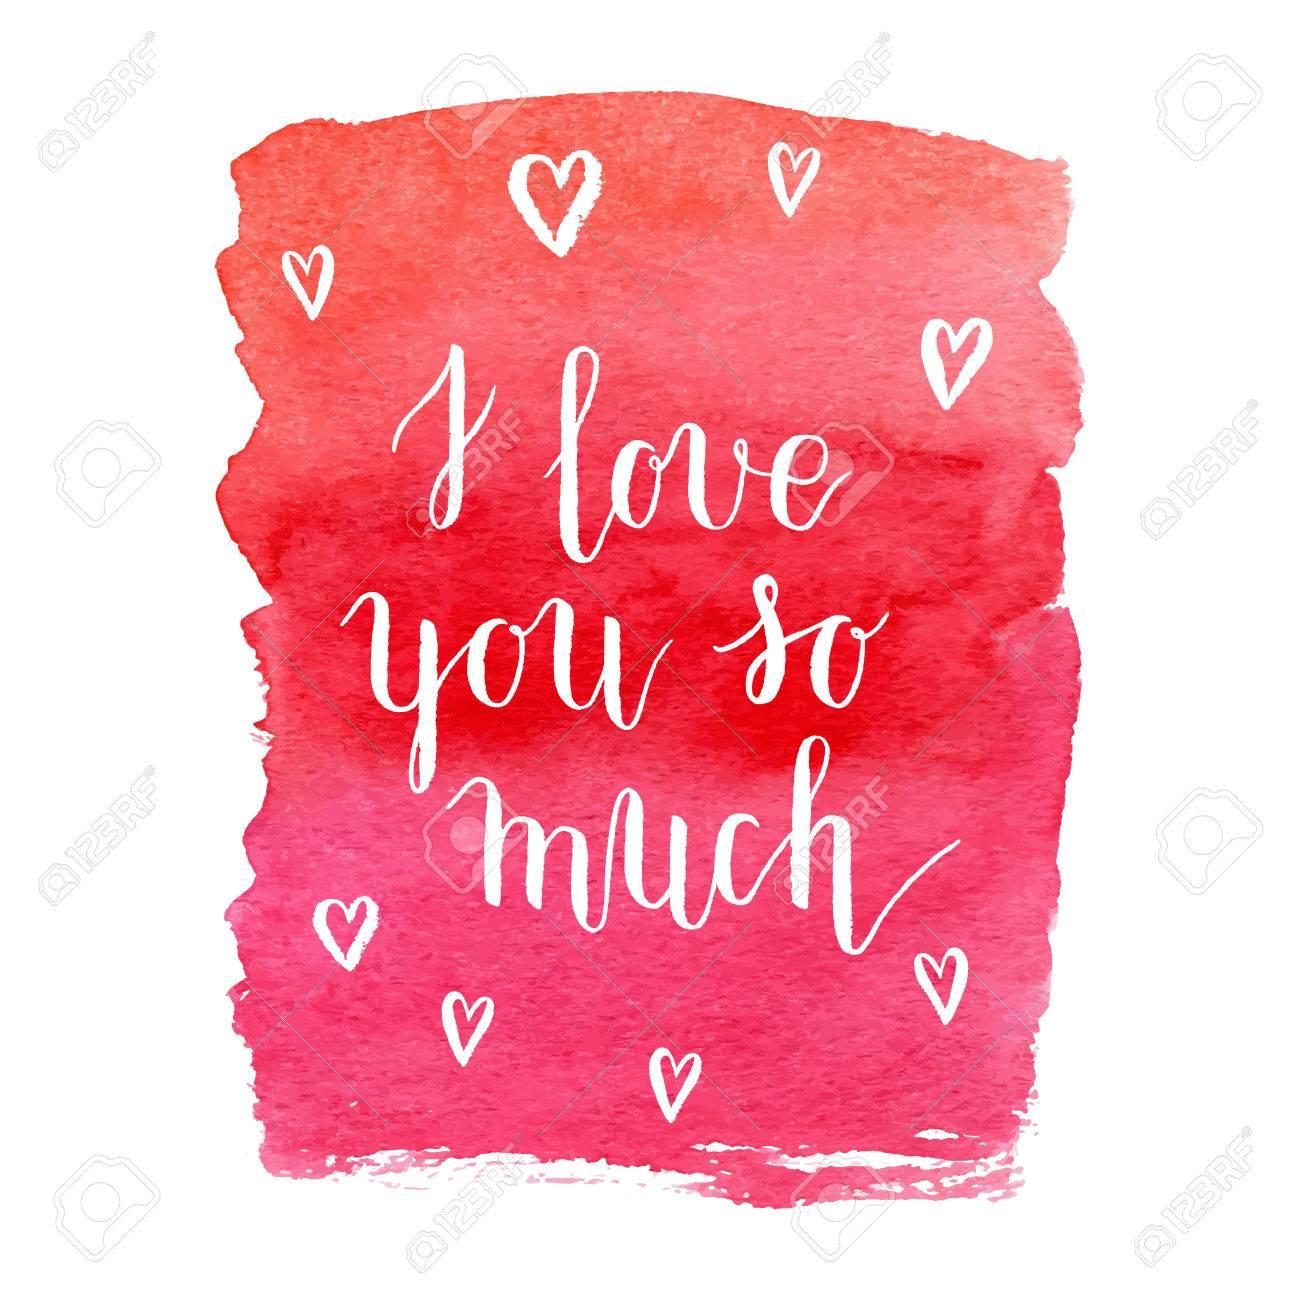 Ich Liebe Dich So Sehr Grusskarte Plakat Mit Rotem Aquarell Fleck